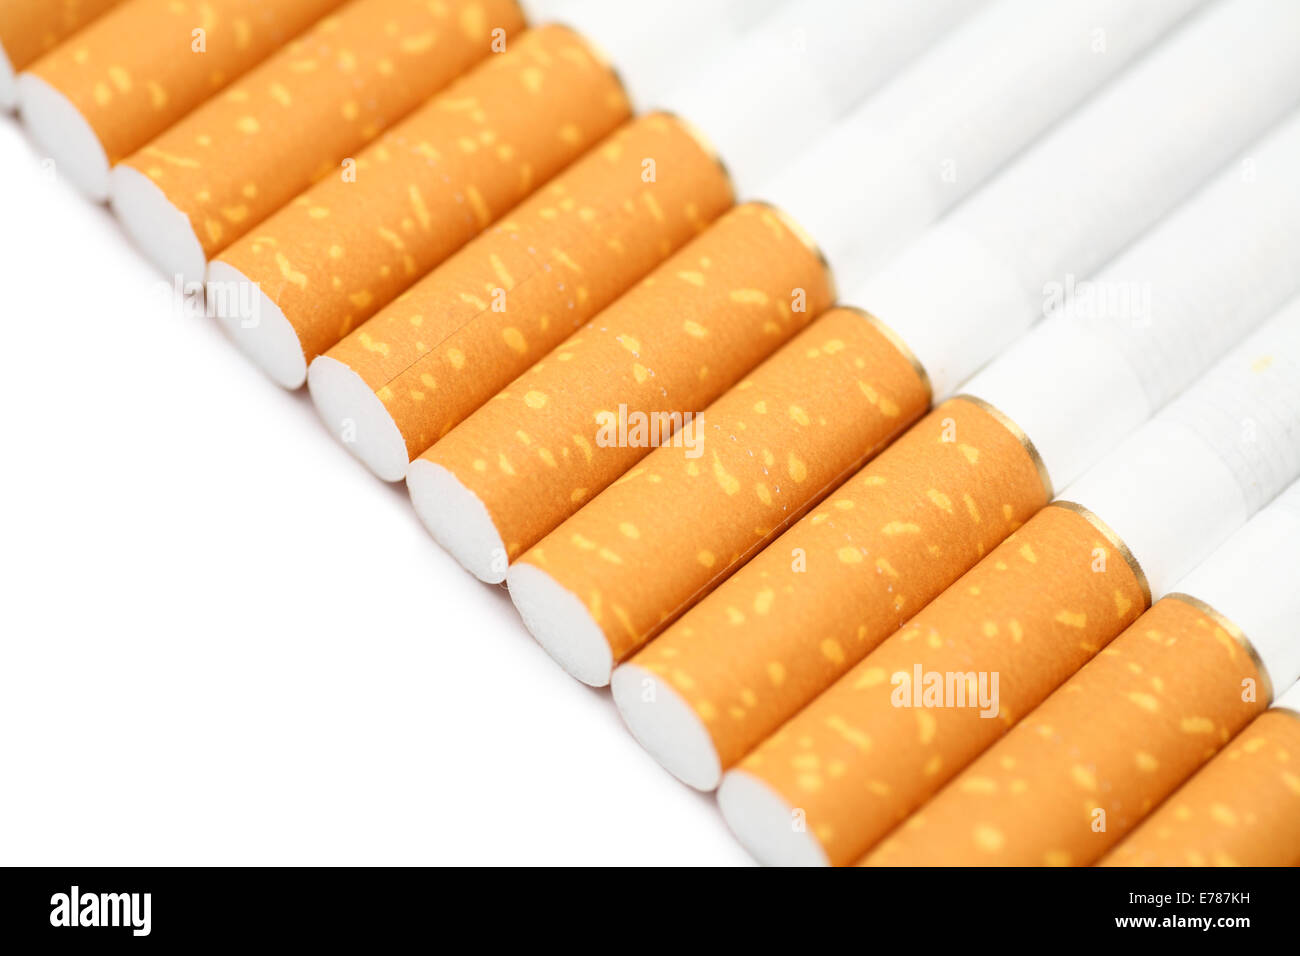 Are menthol cigarettes Marlboro good for you